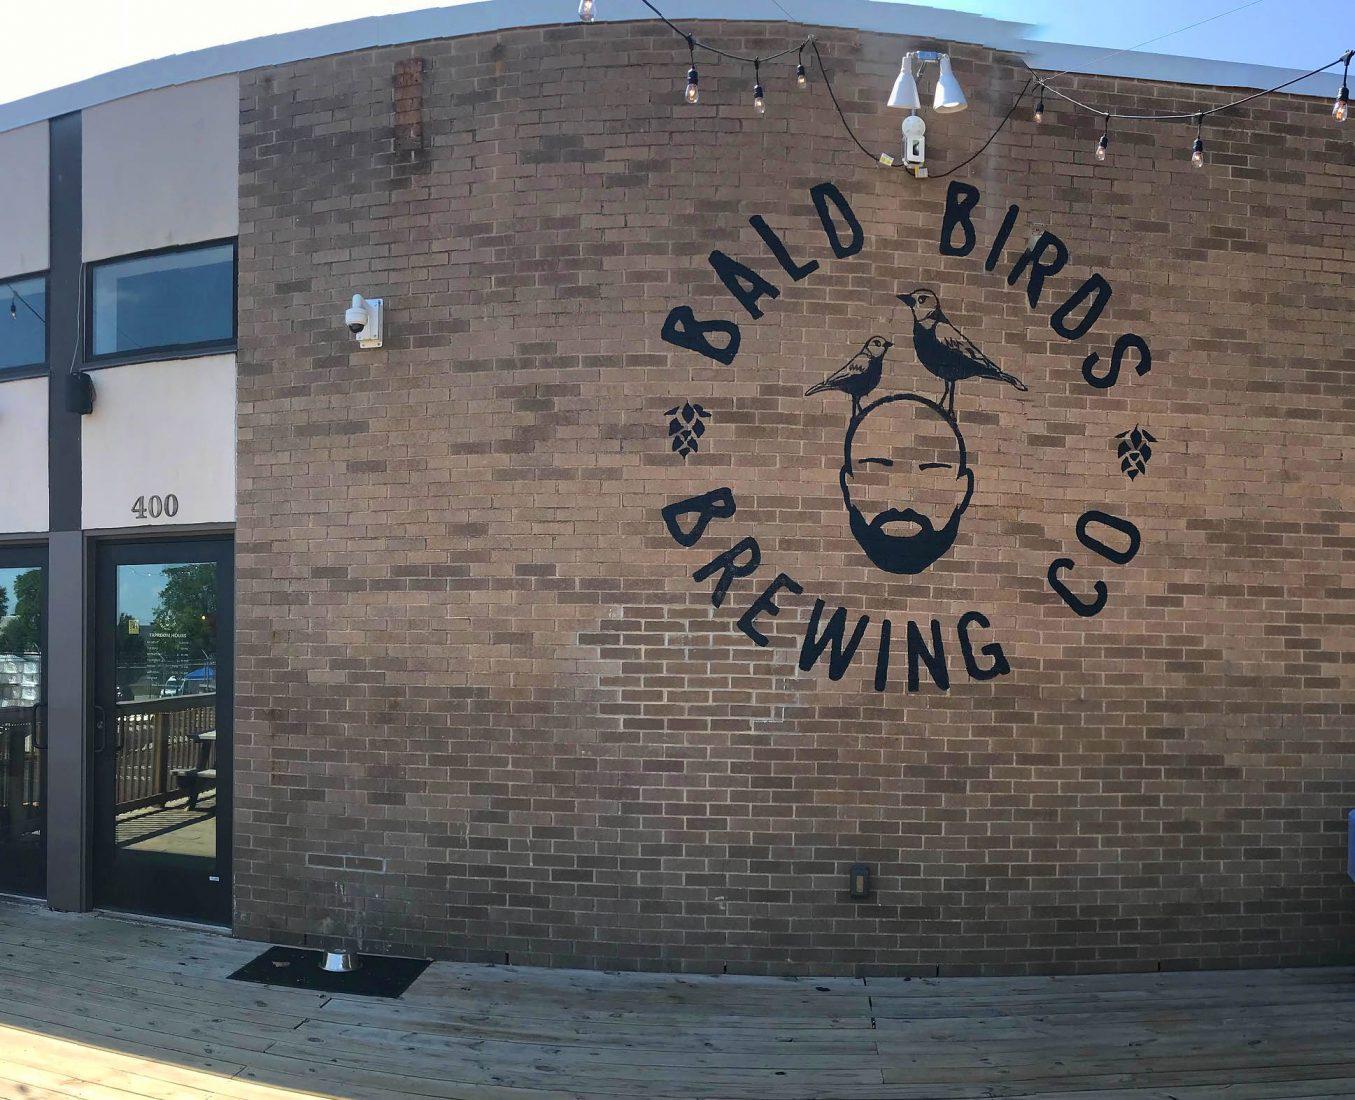 431. Bald Birds Brewing Company, Audubon NJ, 2019